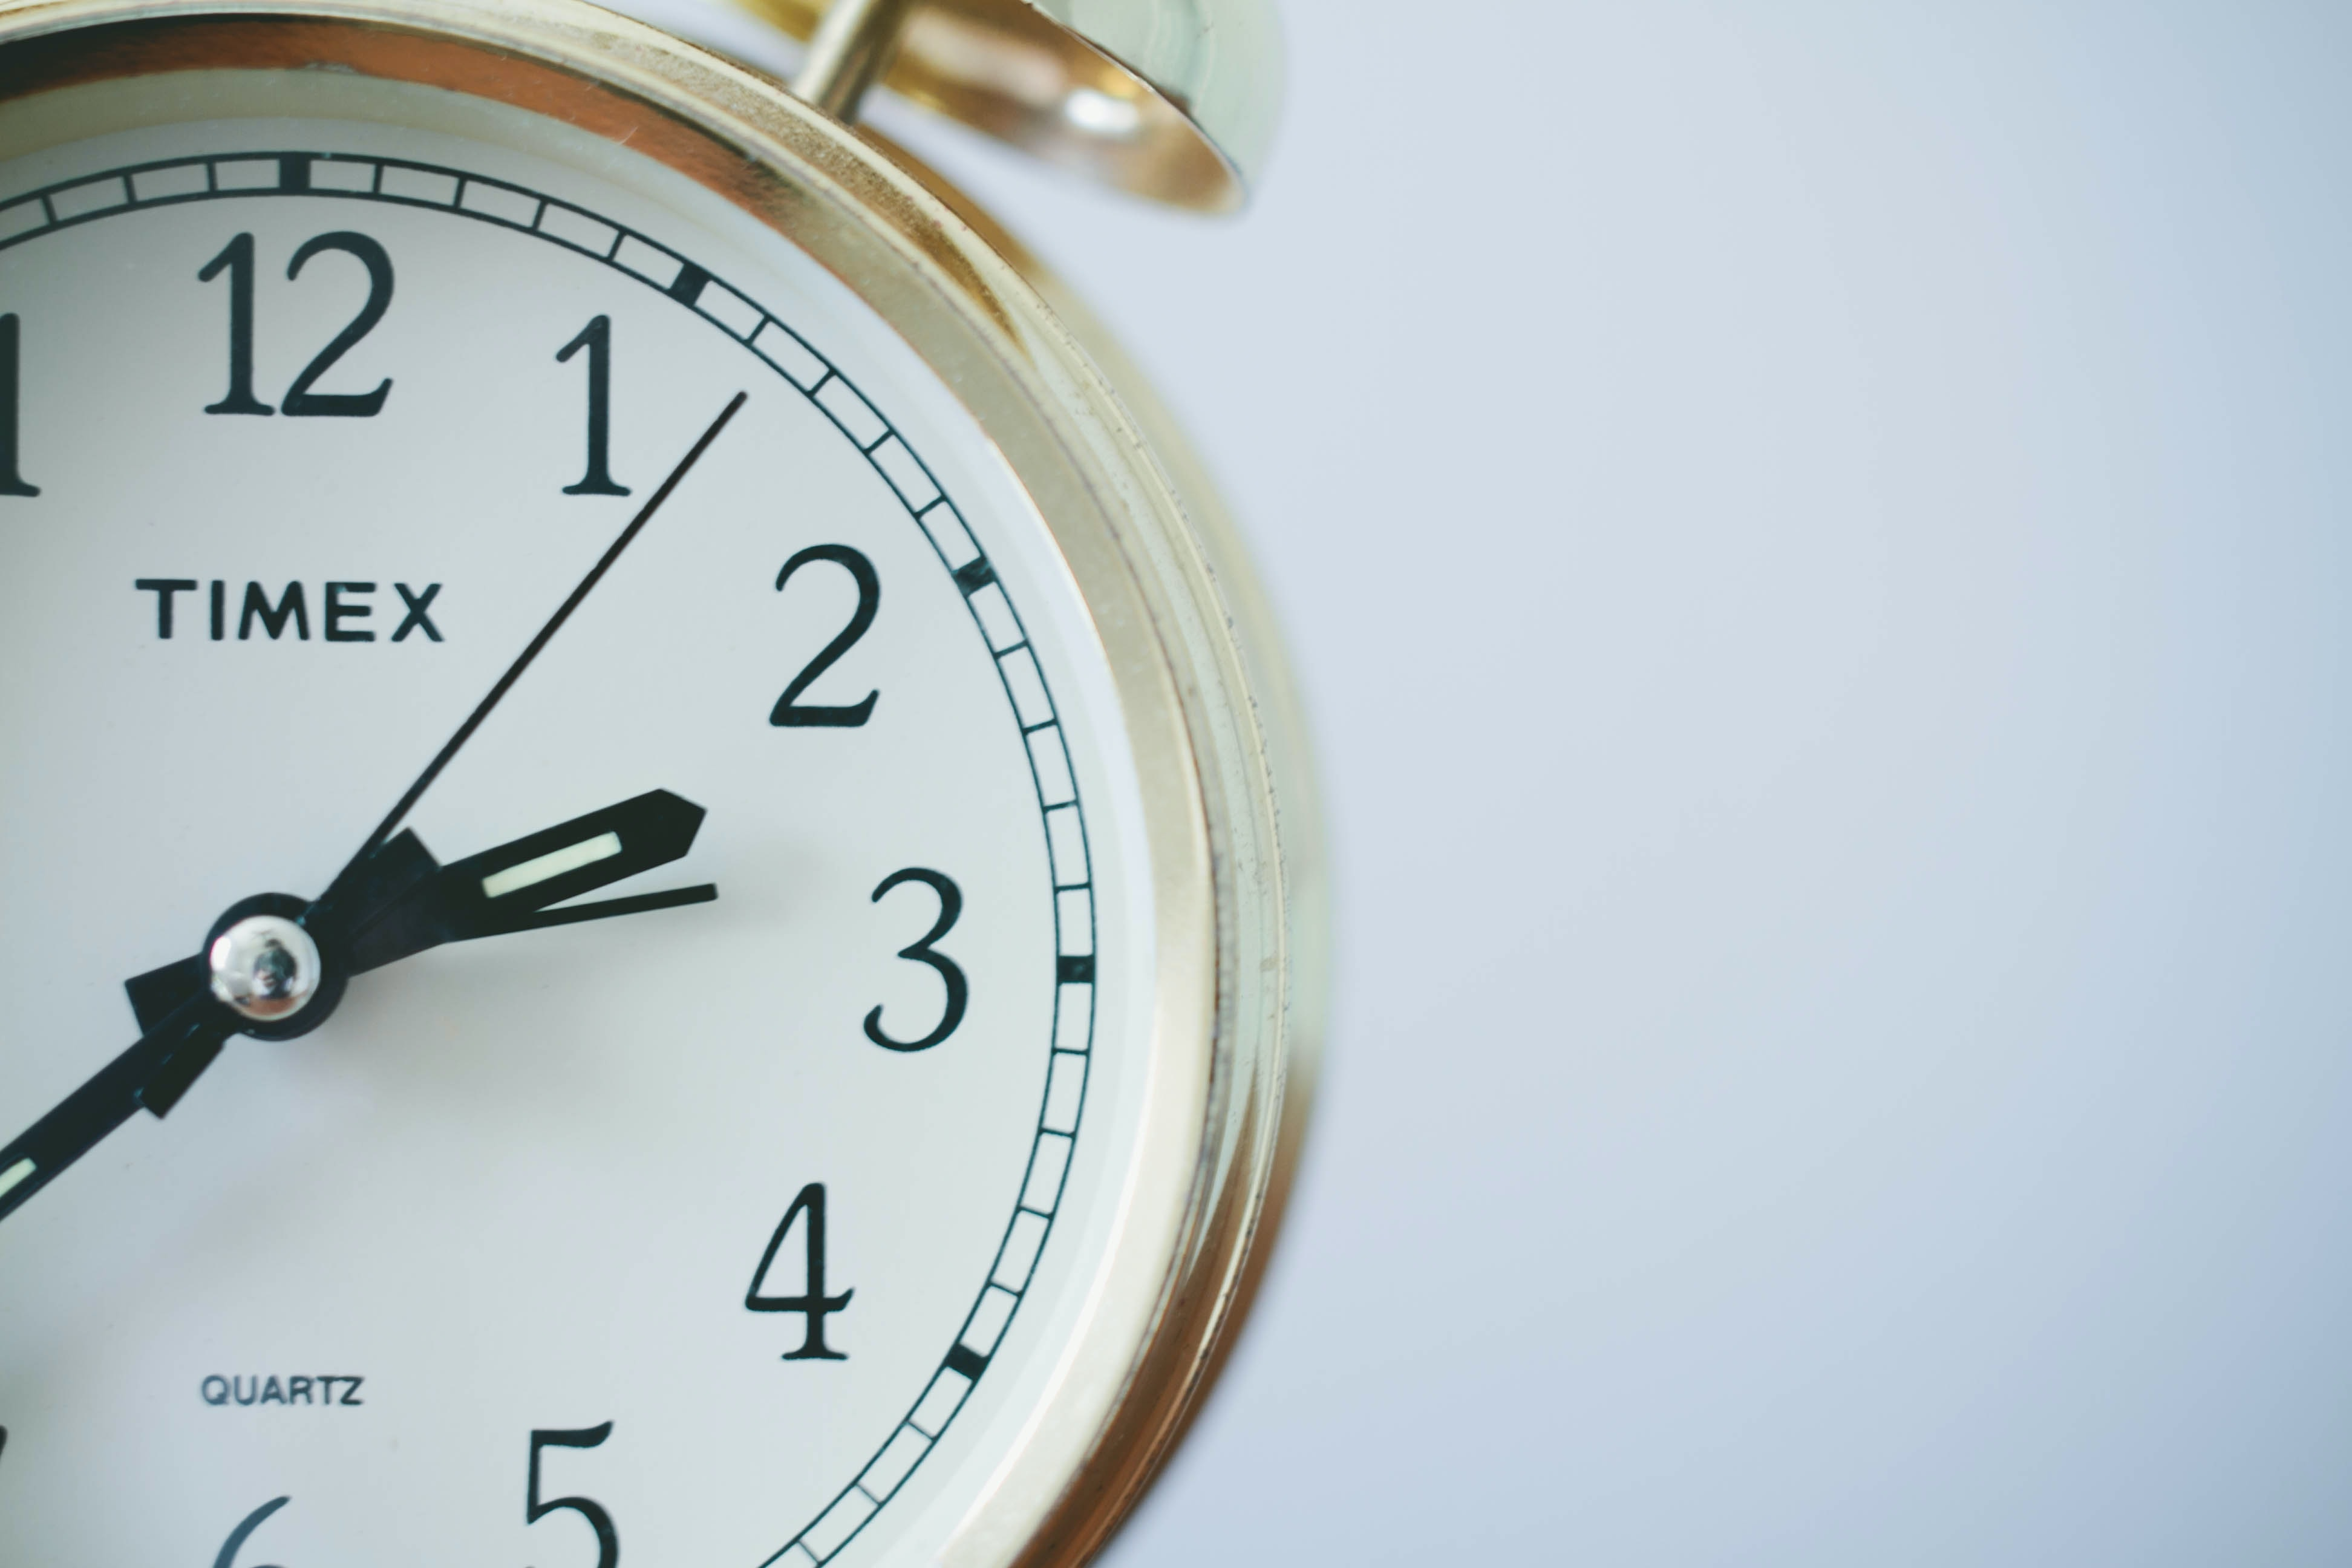 White clock showing 2.40 h.